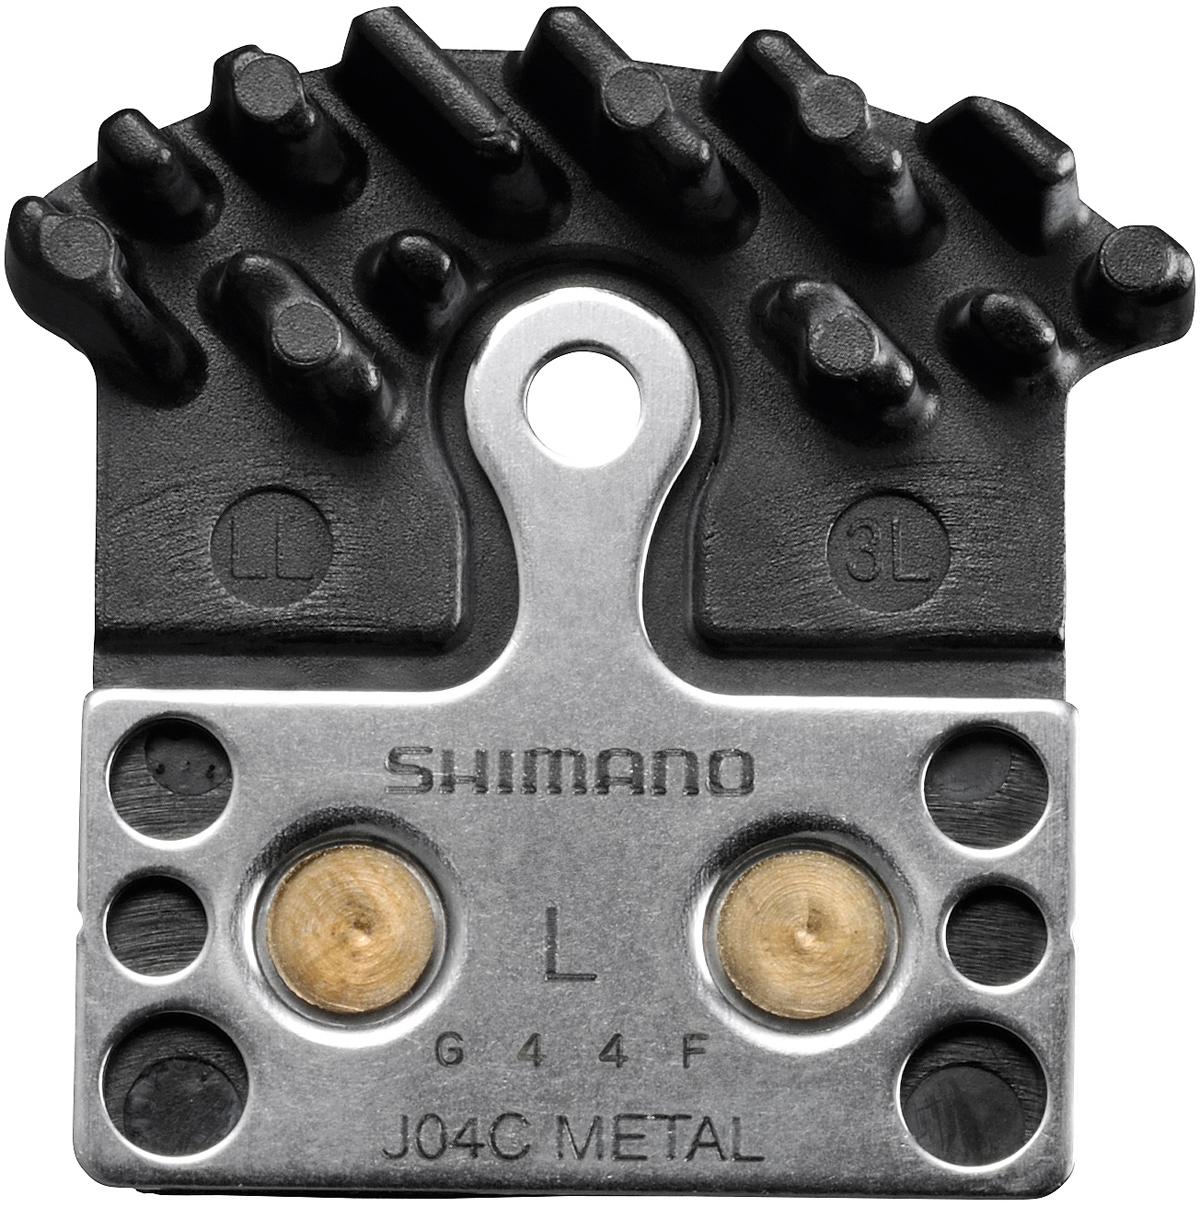 SHIMANO brzd.destičky J04C kovové s chladičem